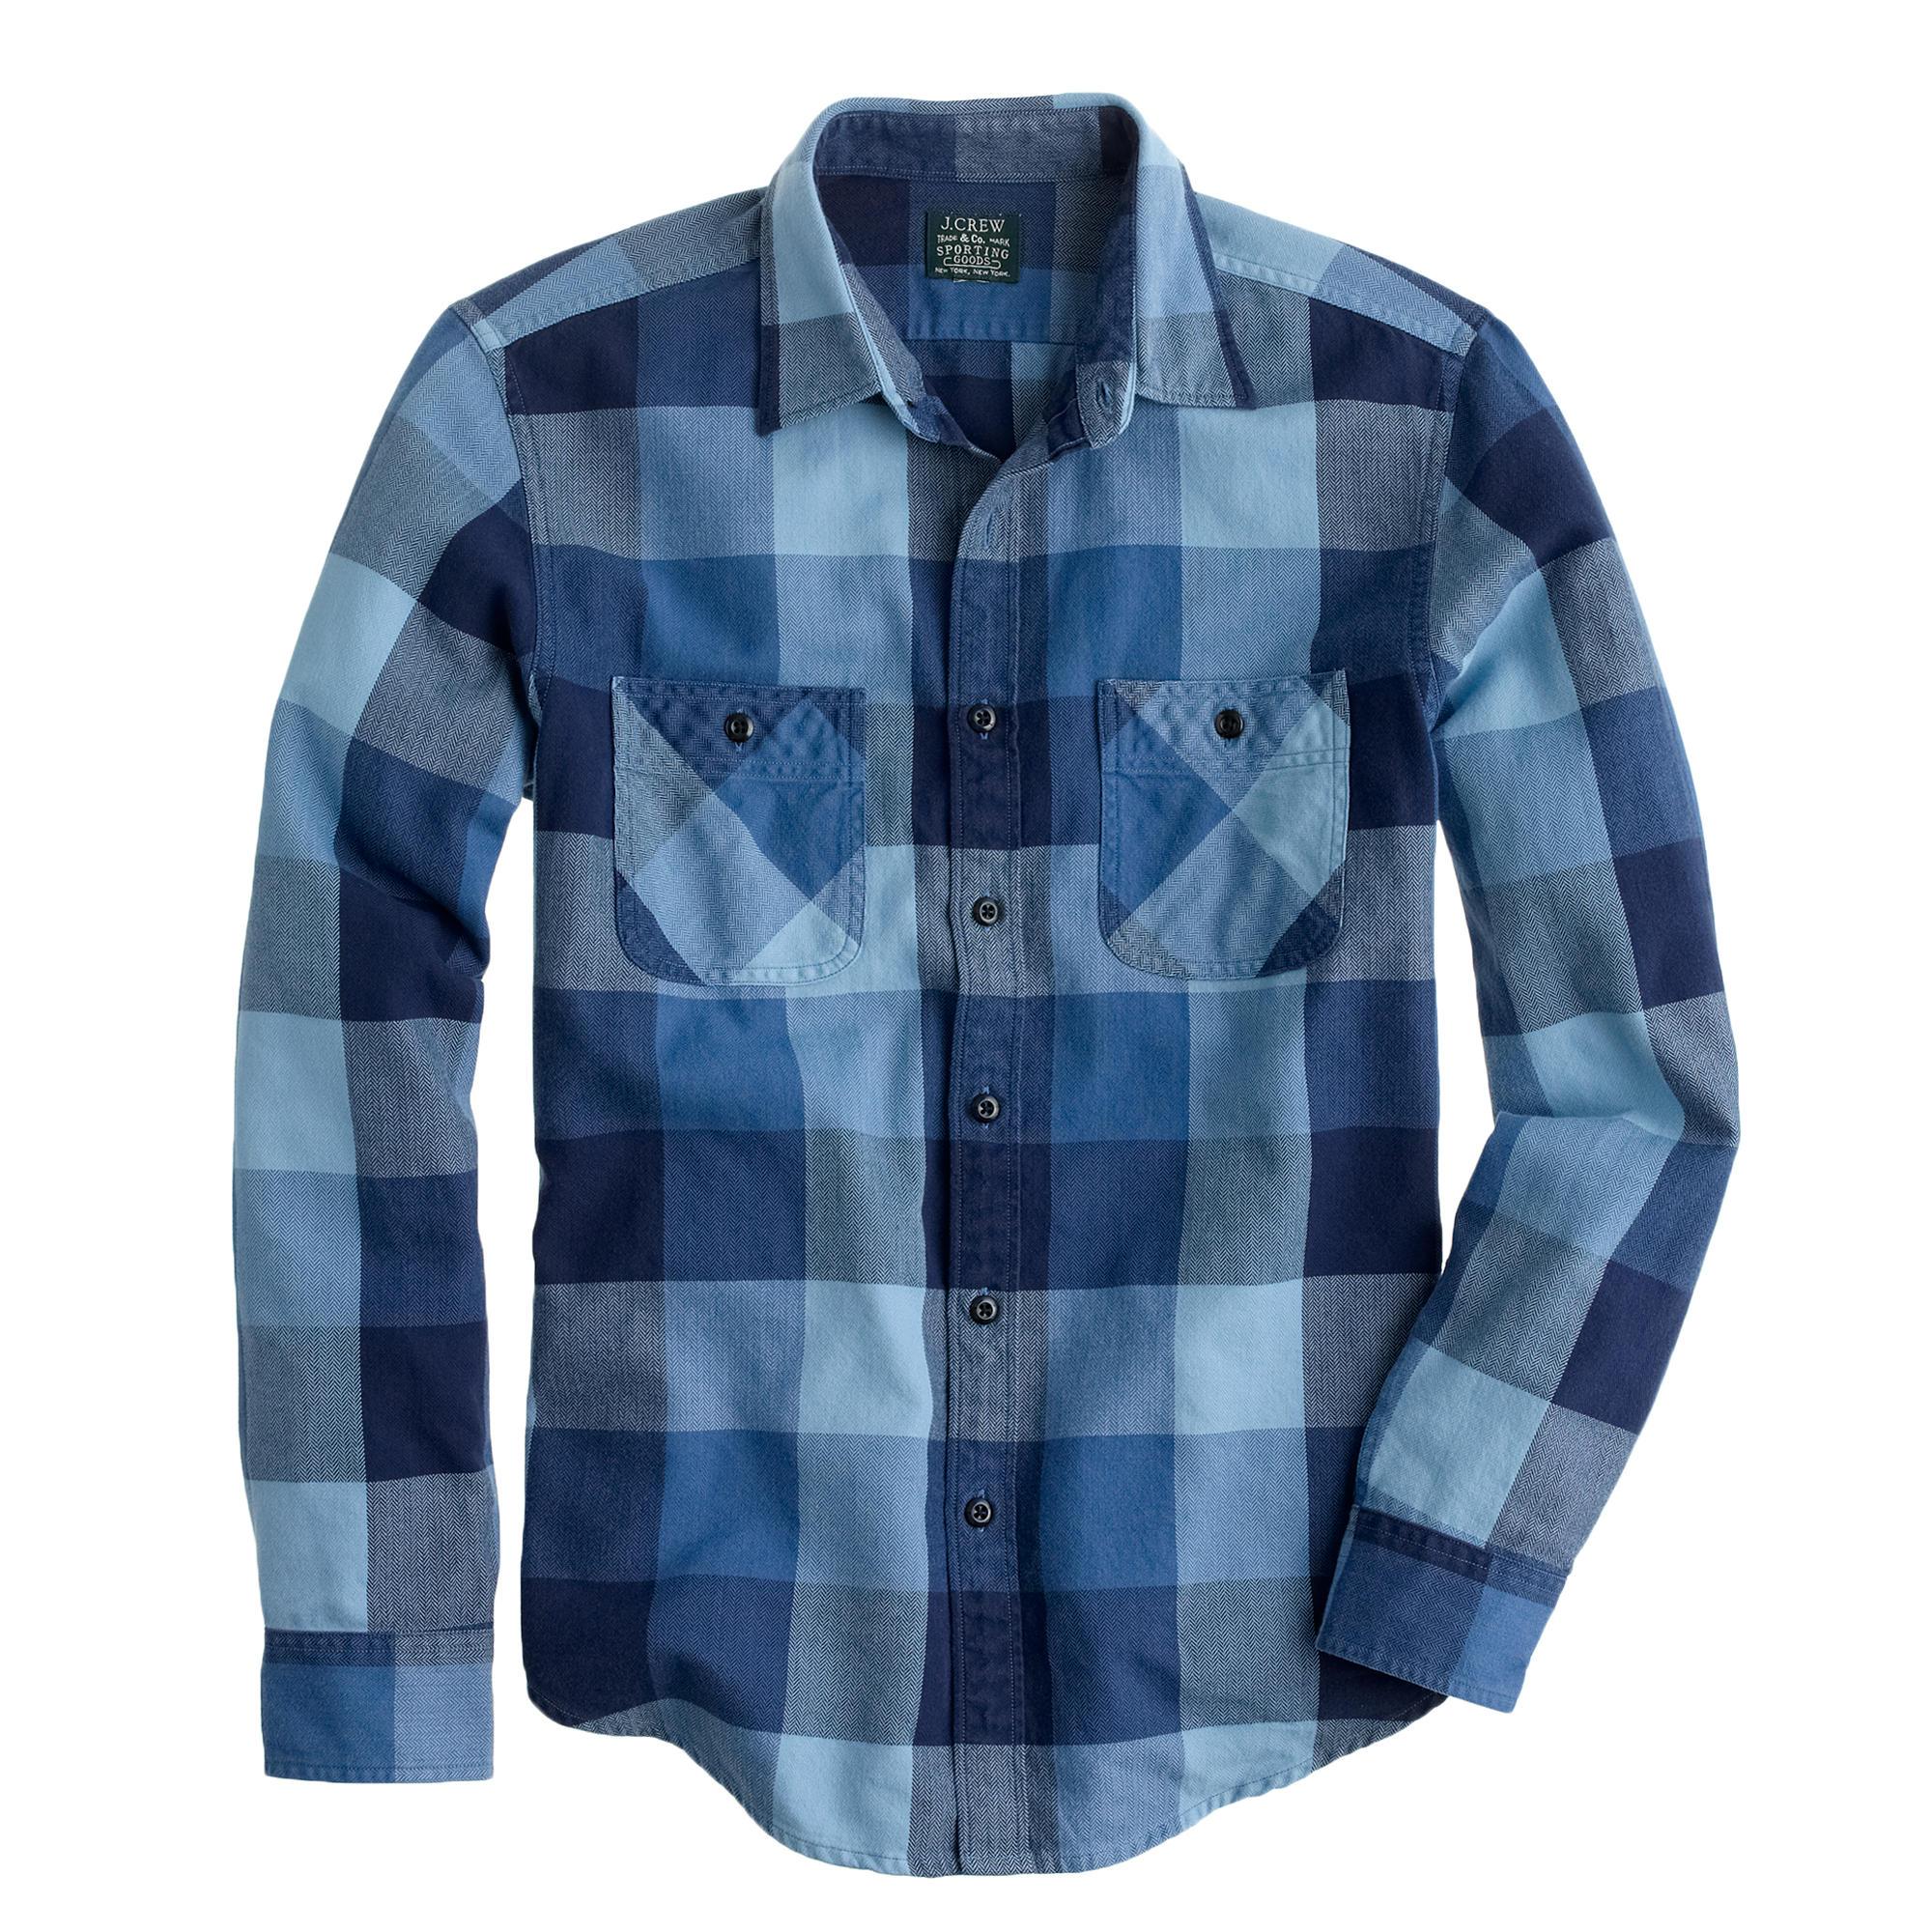 Flannel shirt in warm indigo herringbone plaid j crew for Mens warm flannel shirts